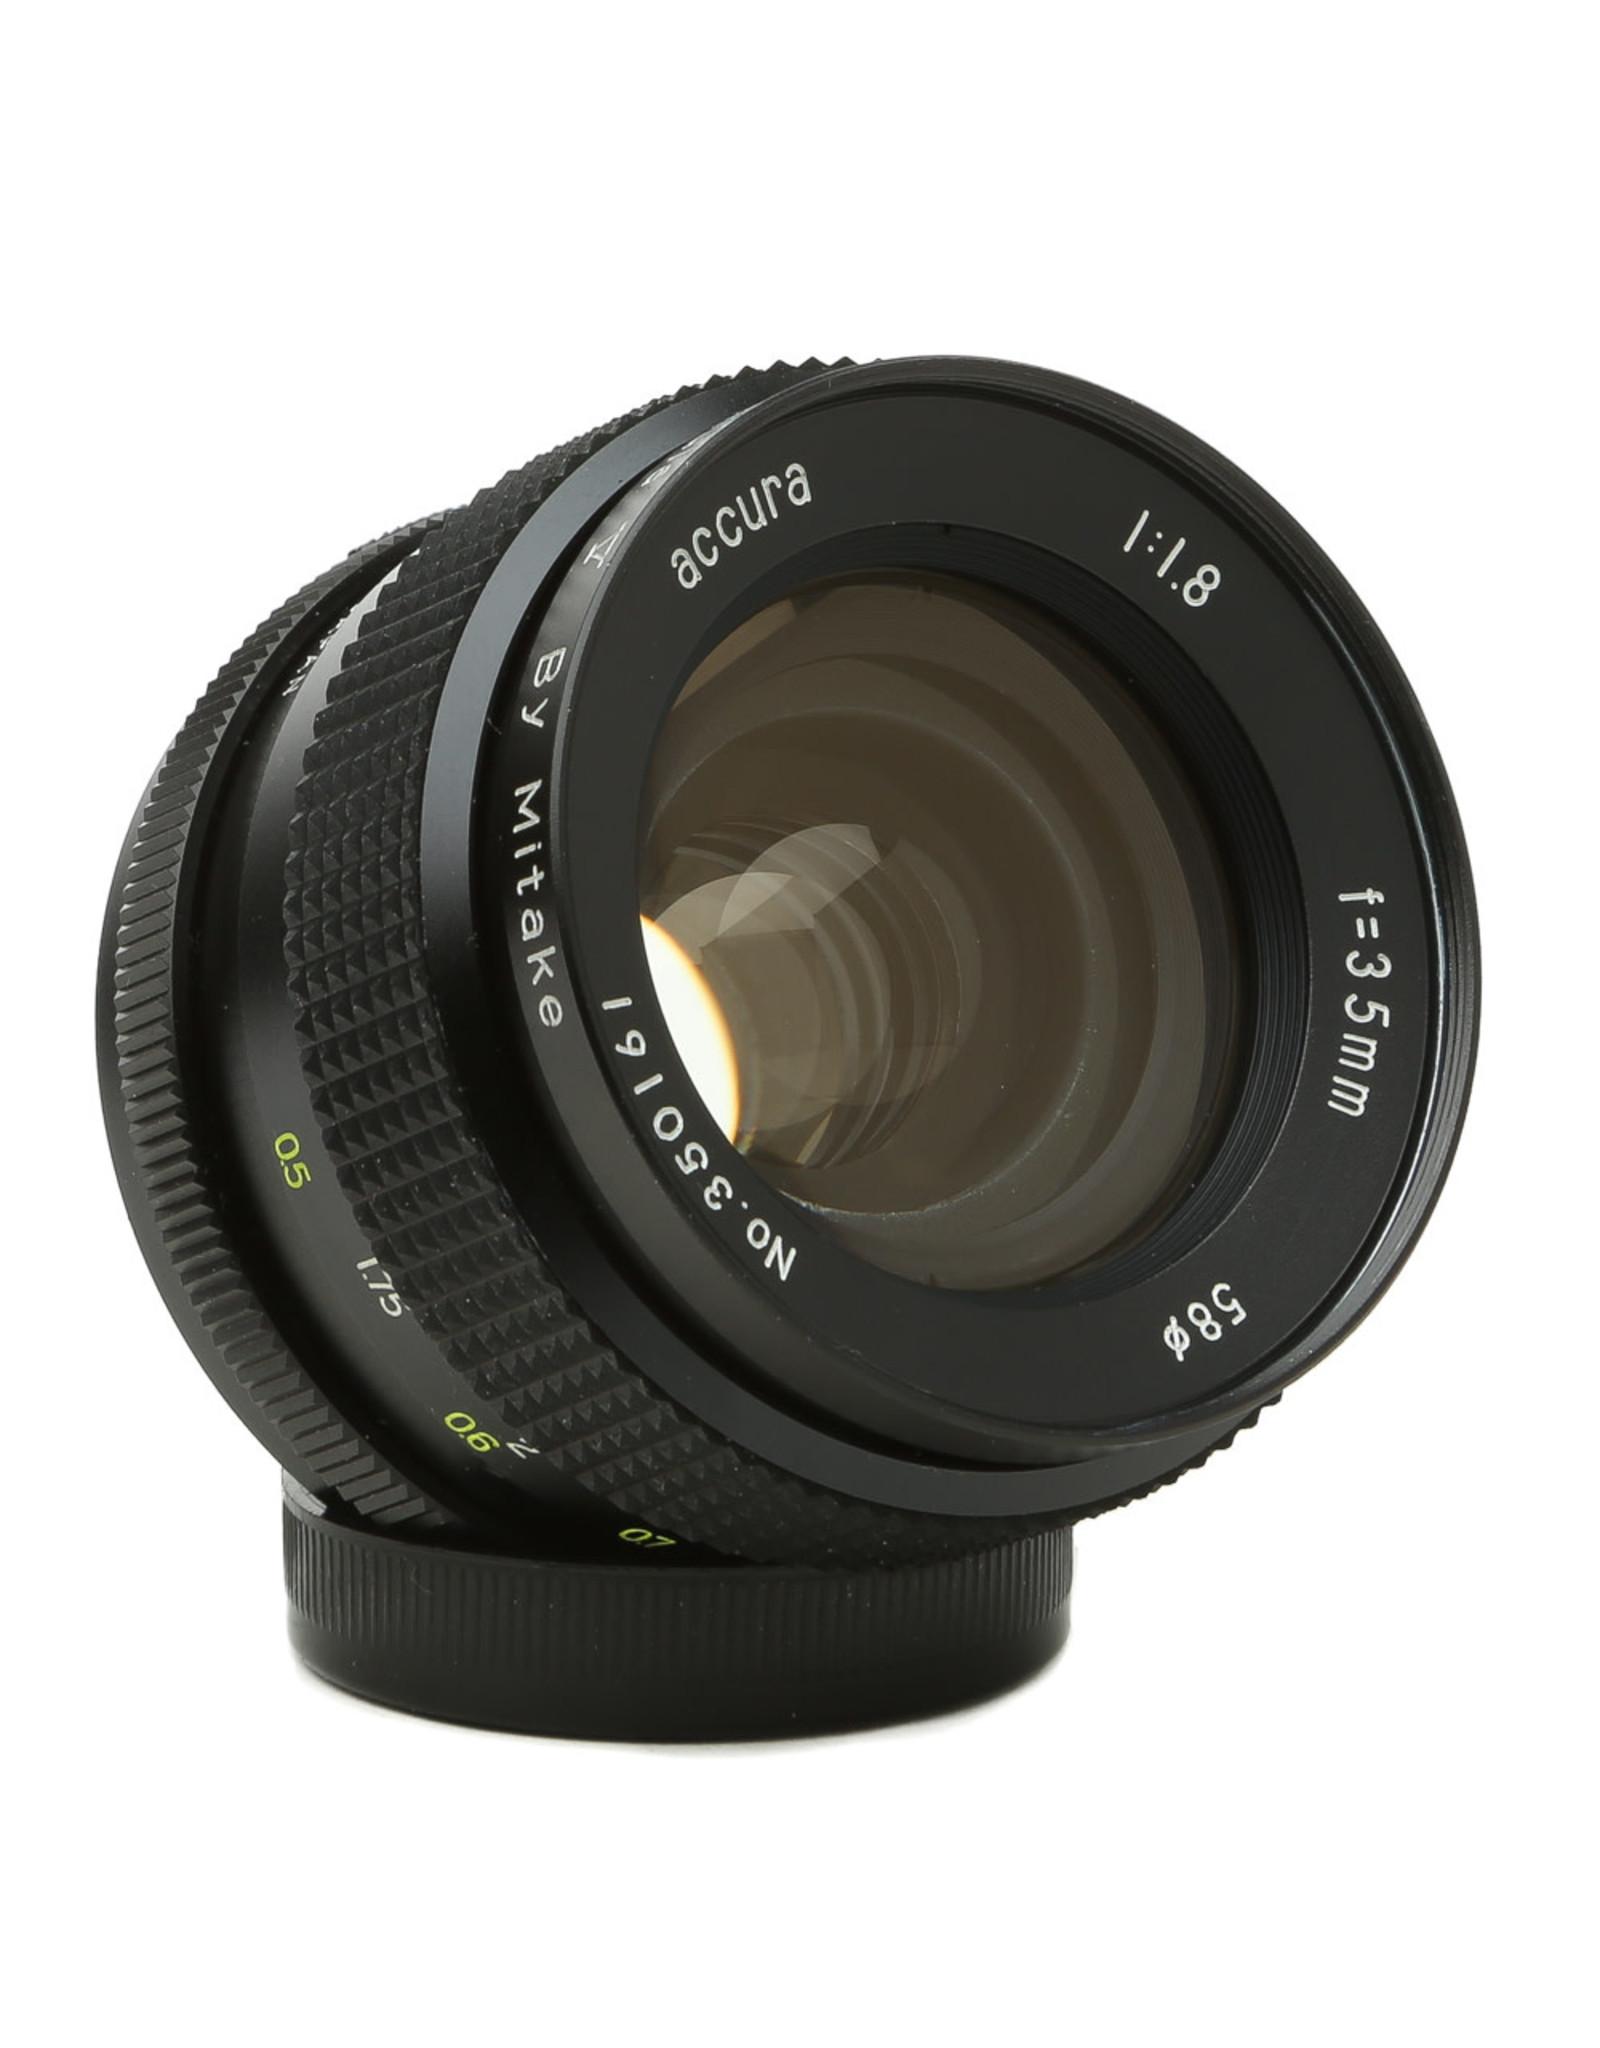 Mitake Accura 35mm f1.8 Formula V Lens M42 Mount